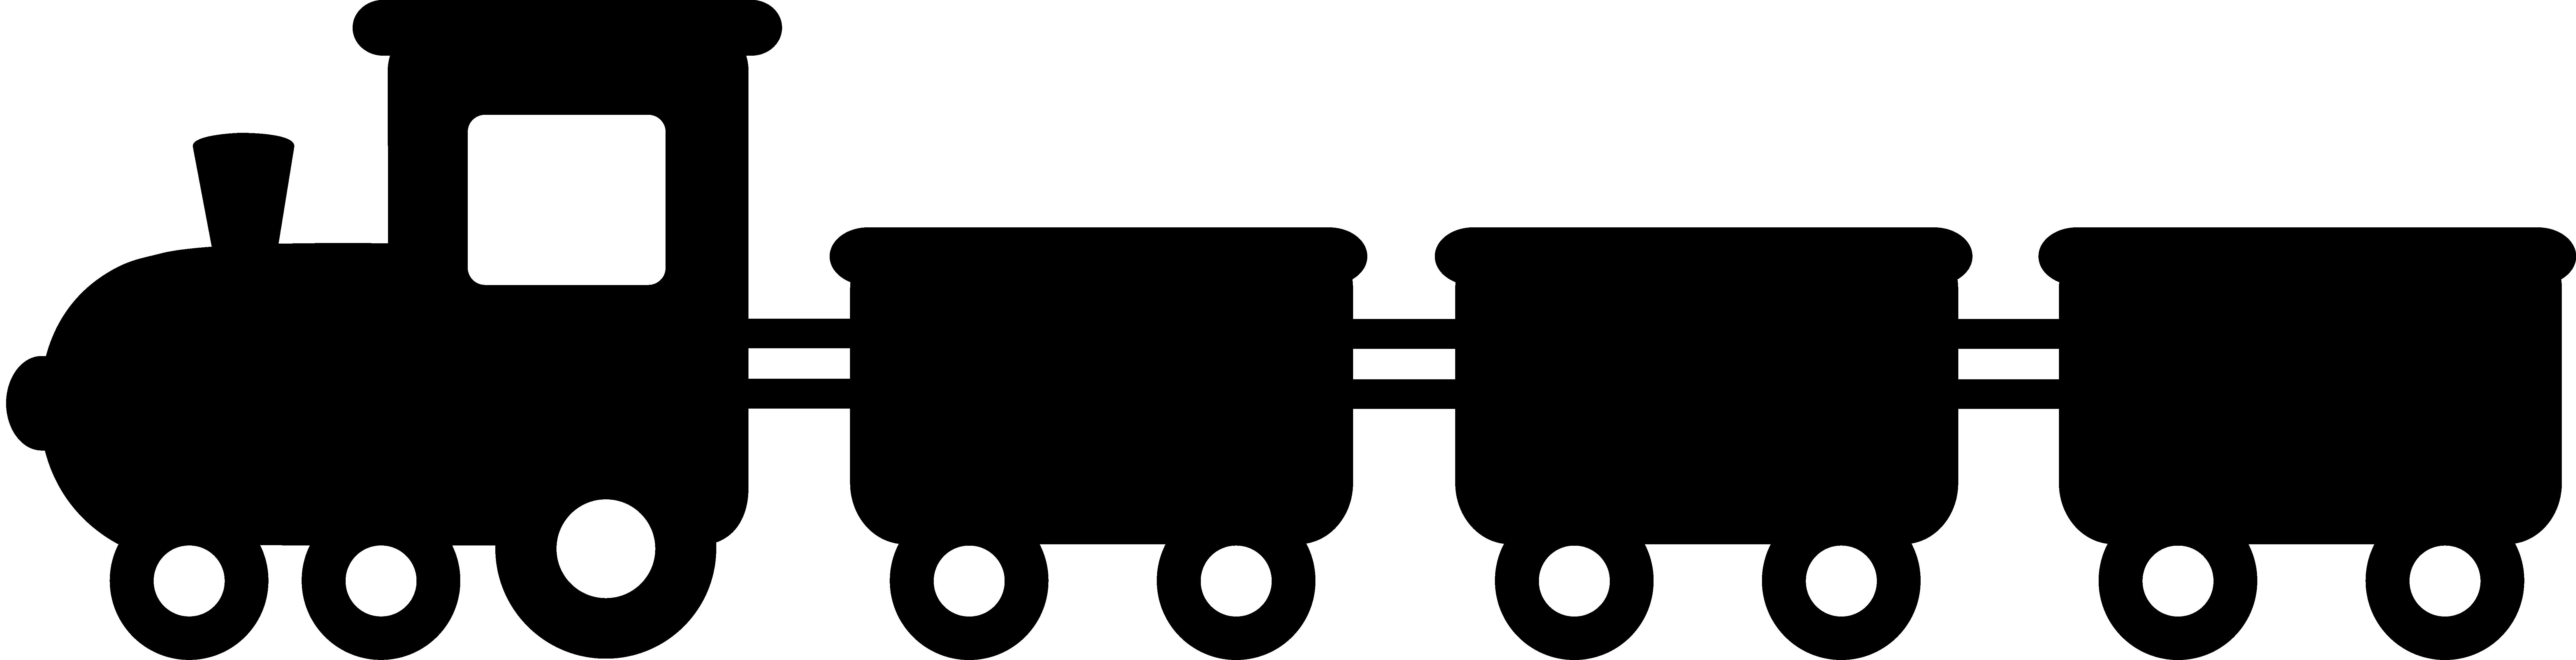 8883x2276 Passenger Train Png Black And White Transparent Passenger Train